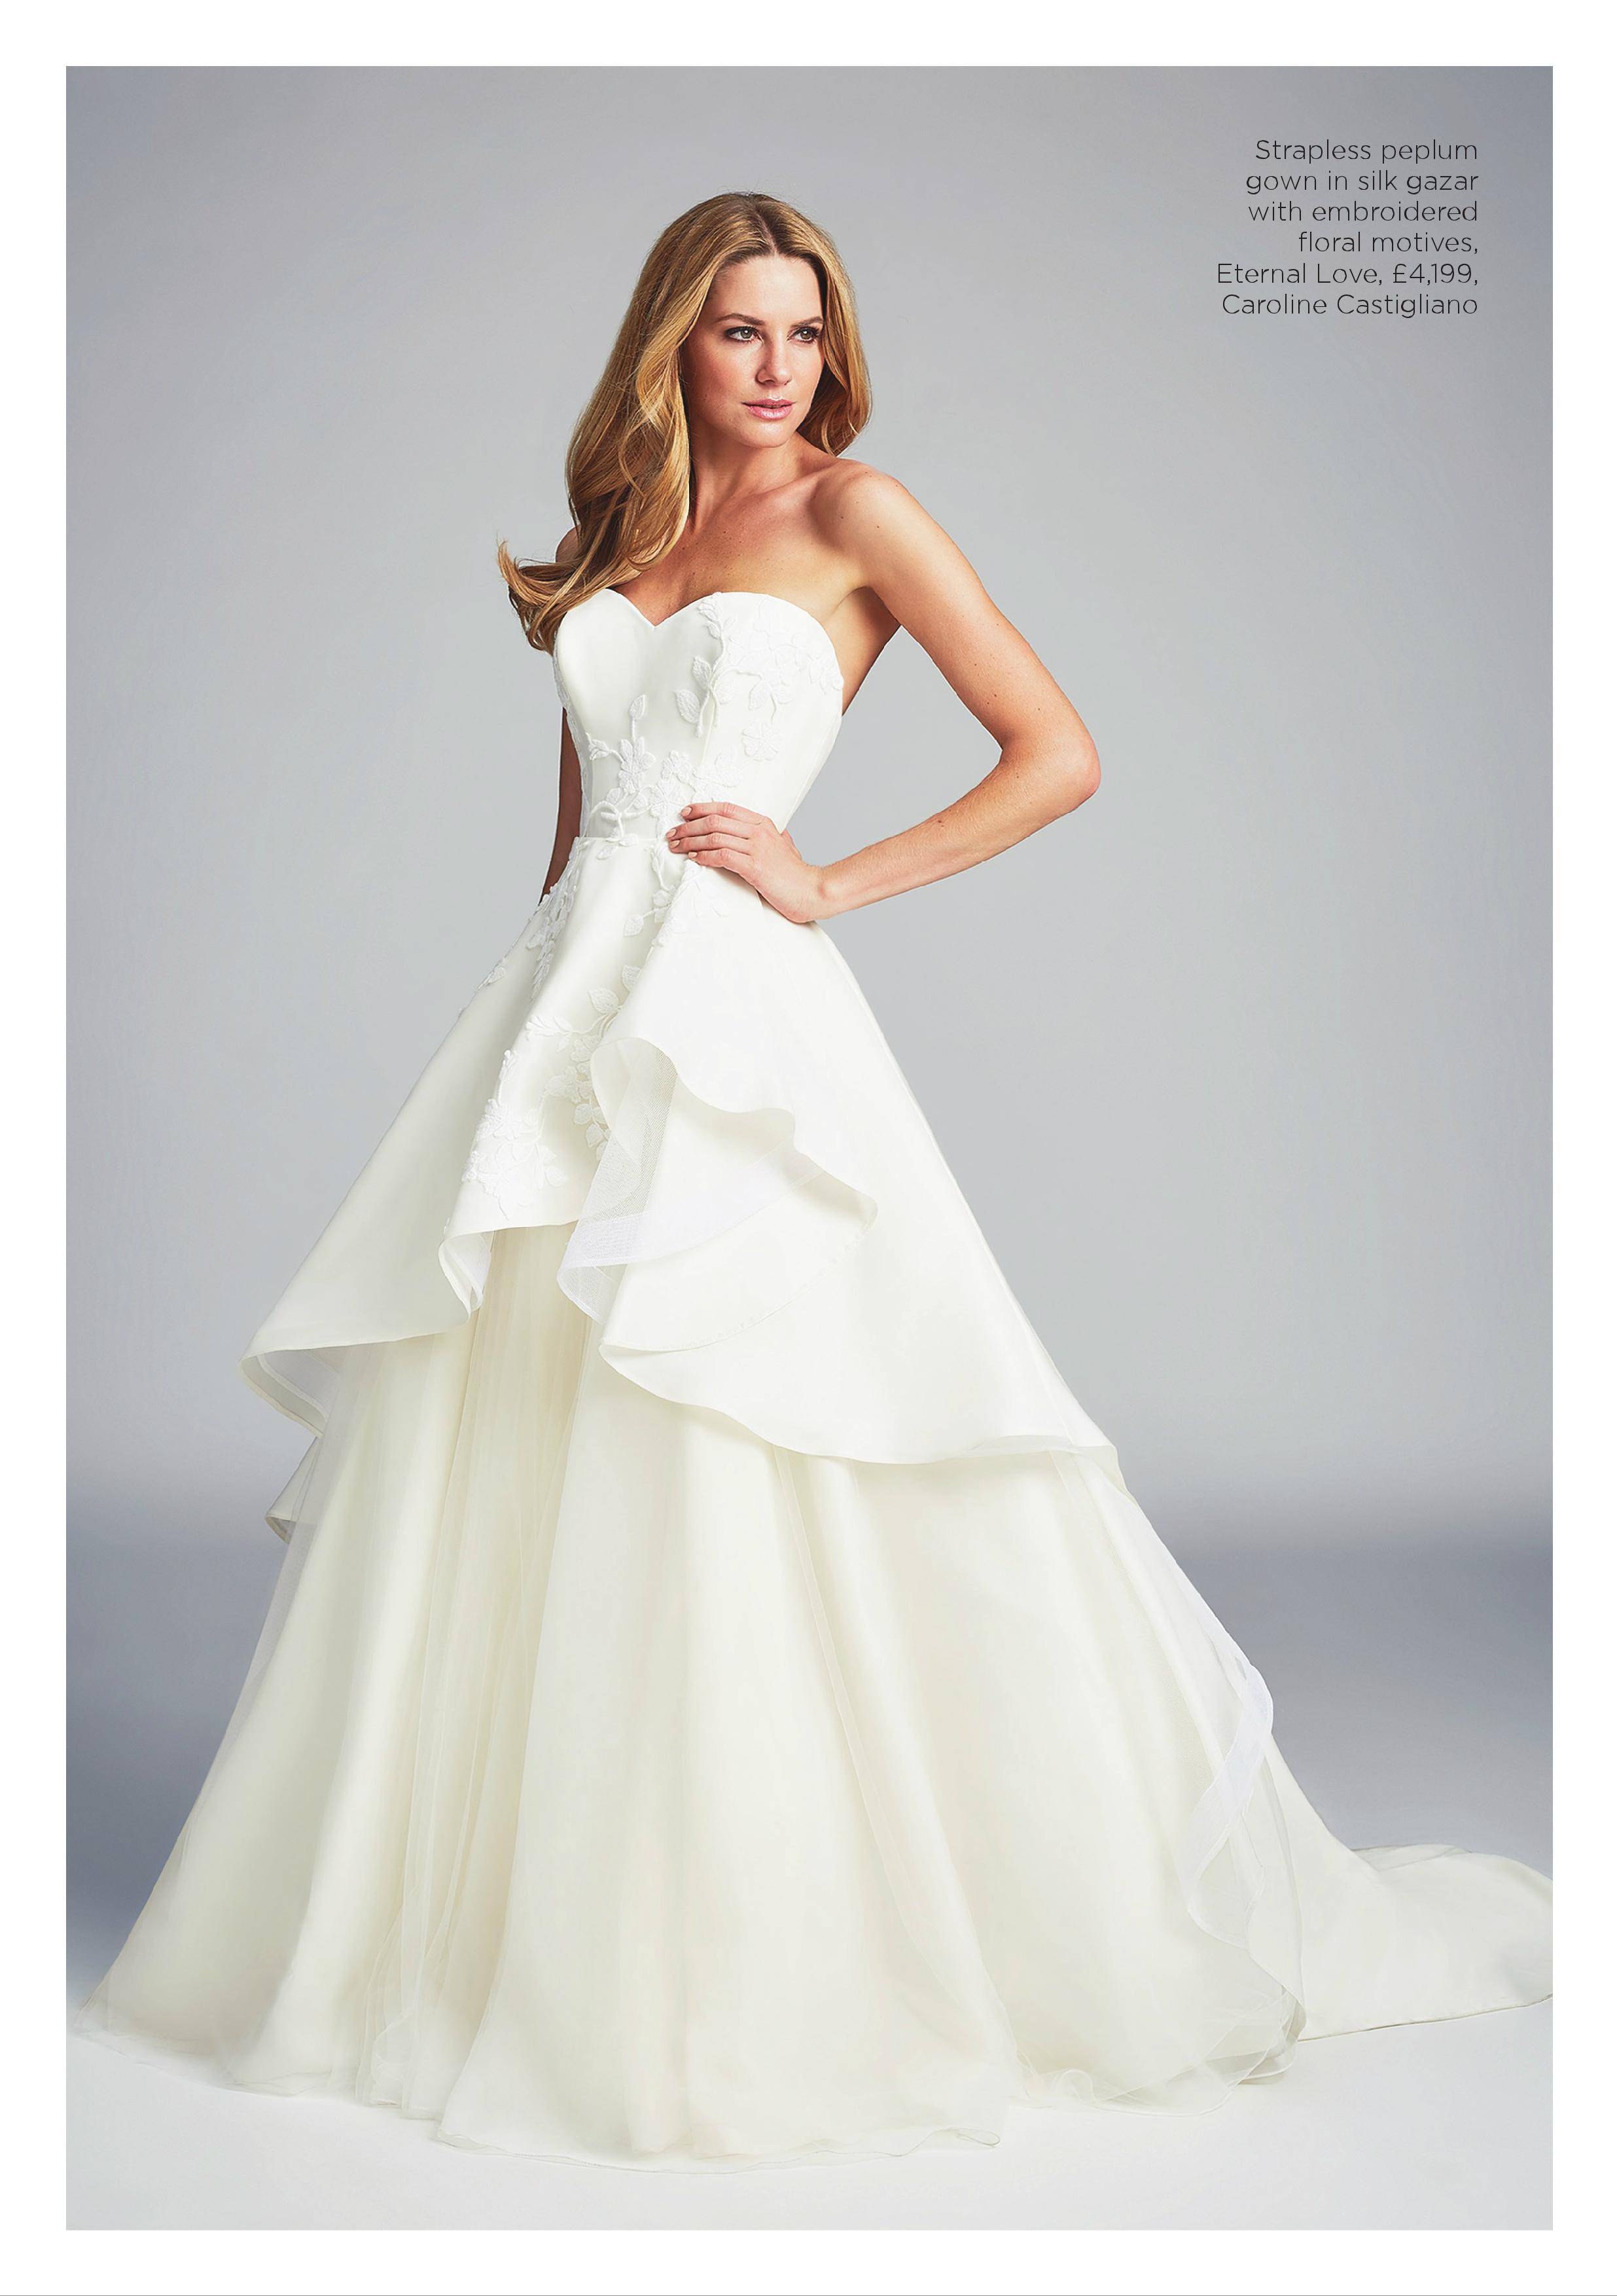 Eternal Love designer wedding gowns by Caroline Castigliano